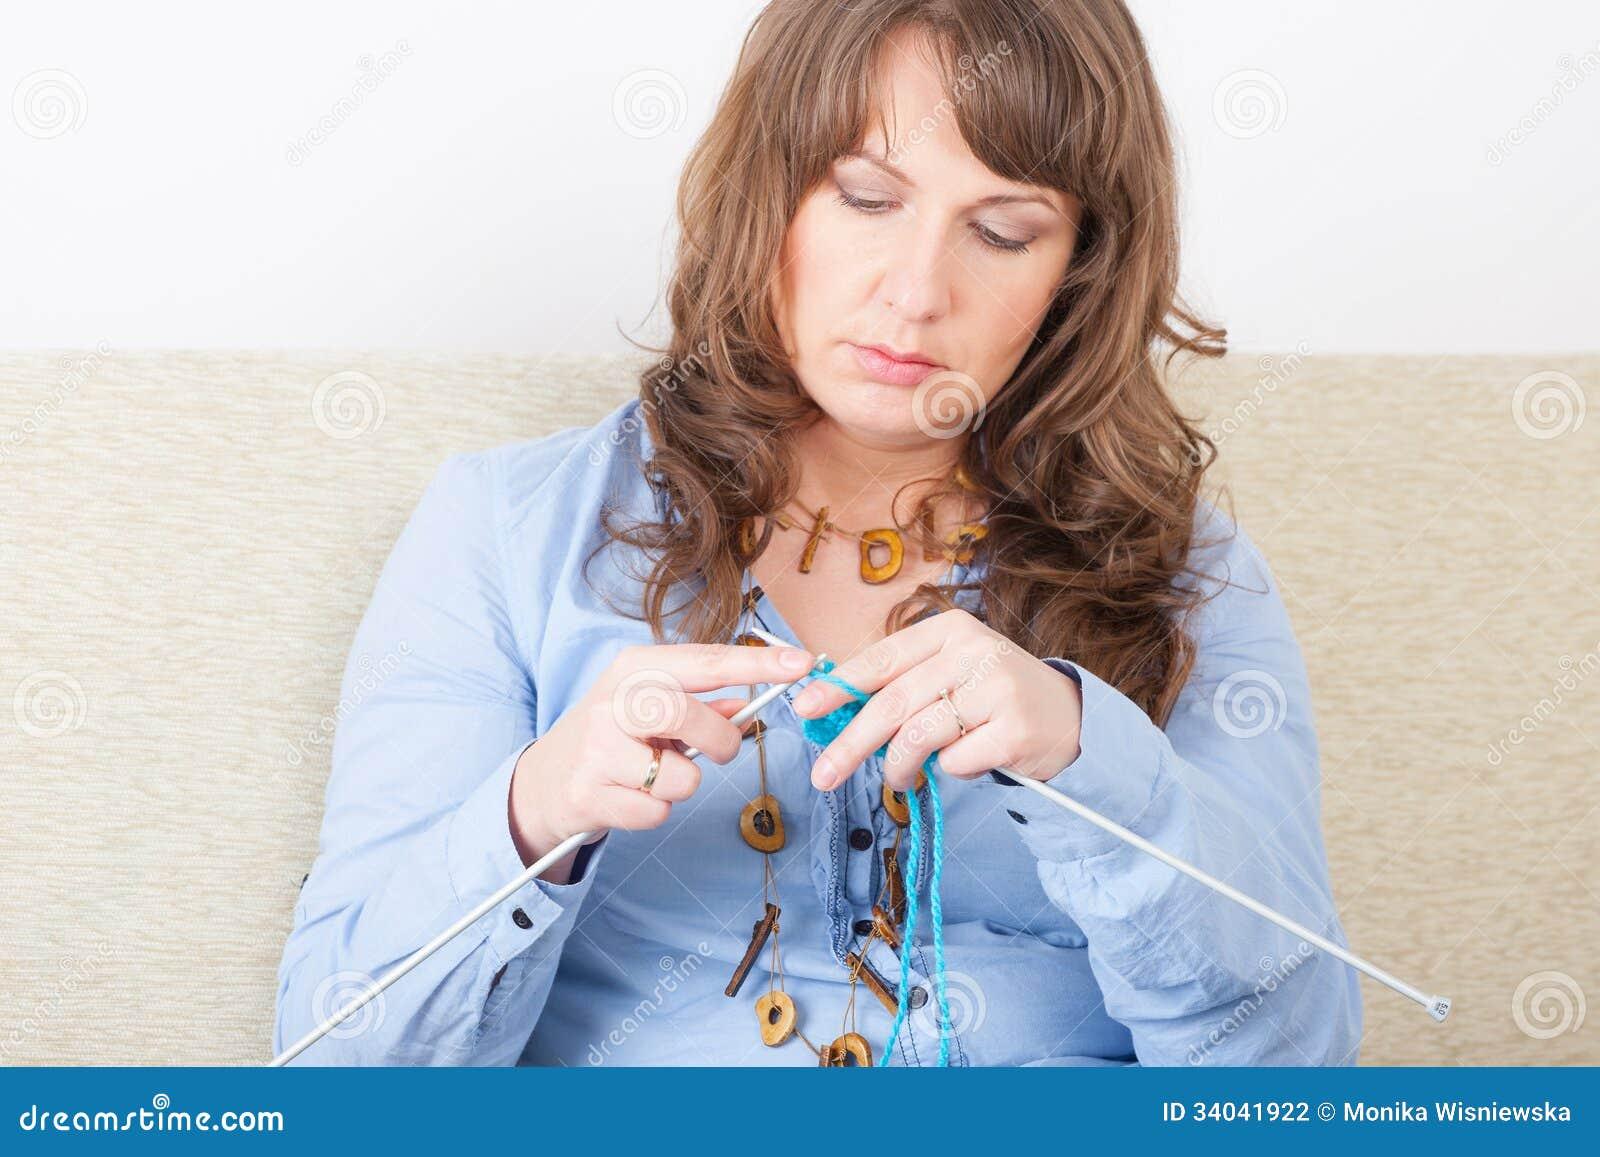 Old Knitting Woman : Woman knitting stock photography image